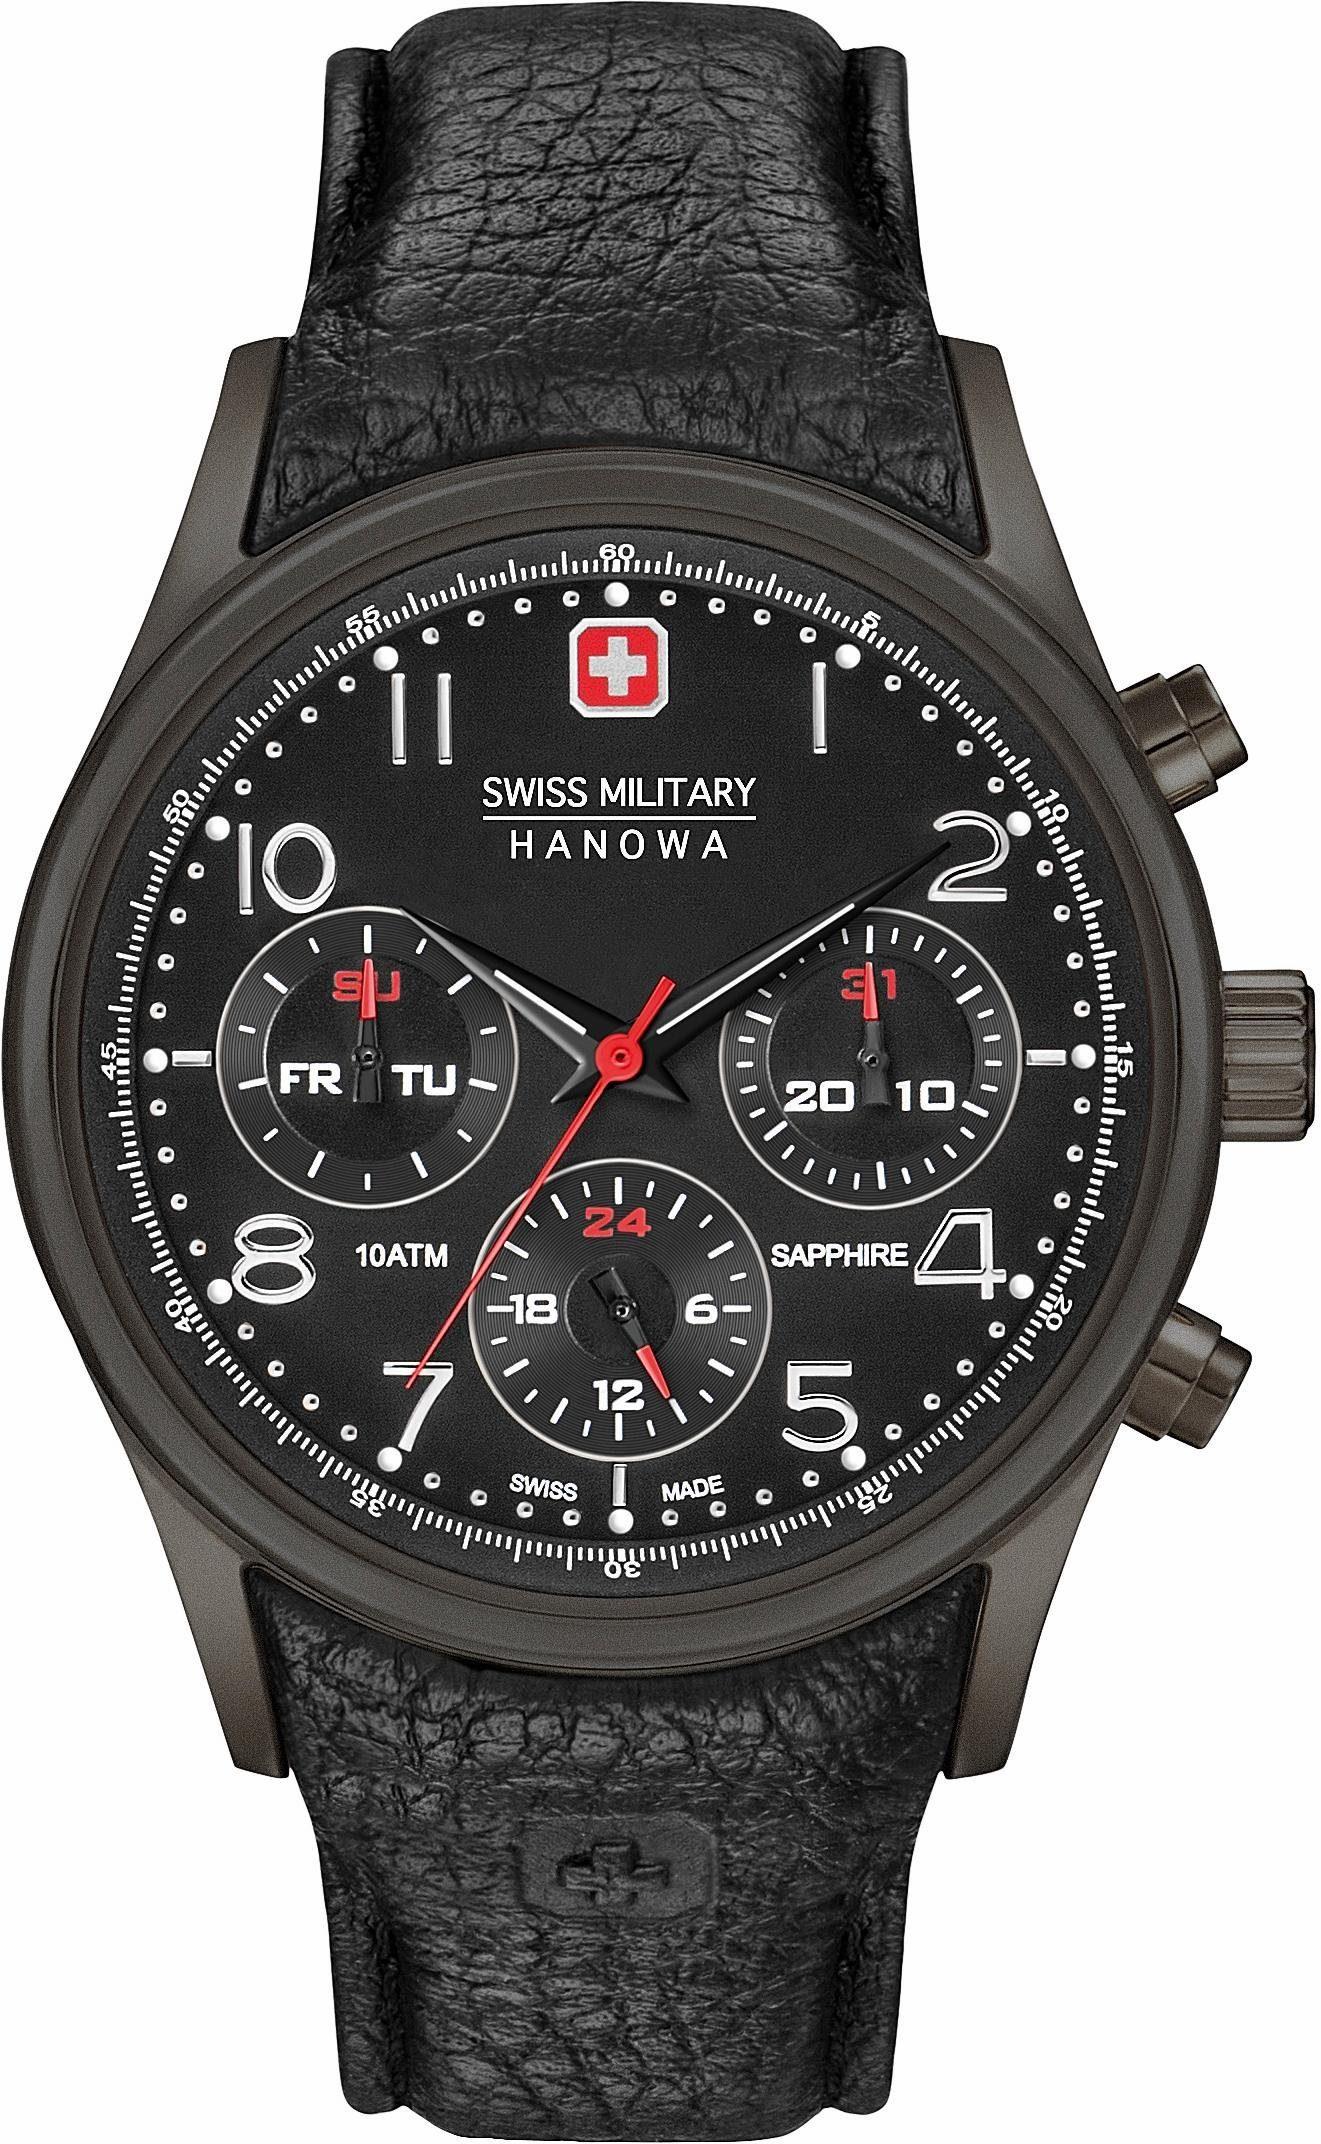 Swiss Military Hanowa Multifunktionsuhr »NAVALUS MULTIFUNCTION, 6-4278.13.007«